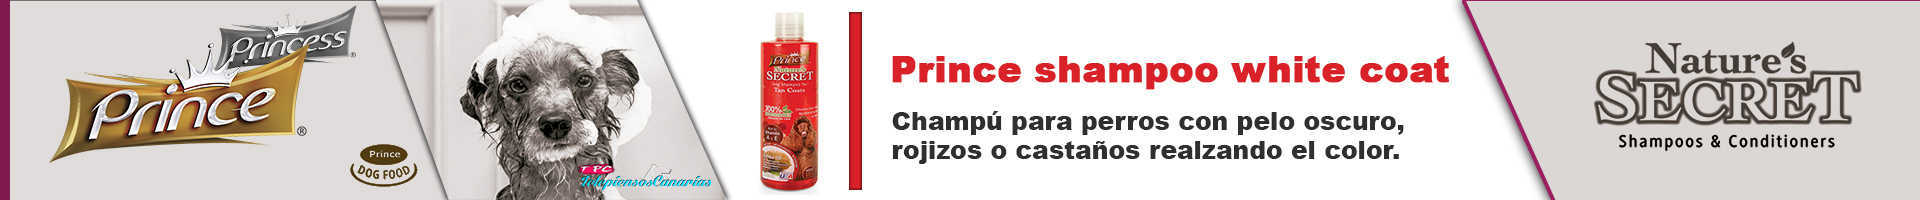 Prince champú pelo oscuro, rojizos o castaños realza el color